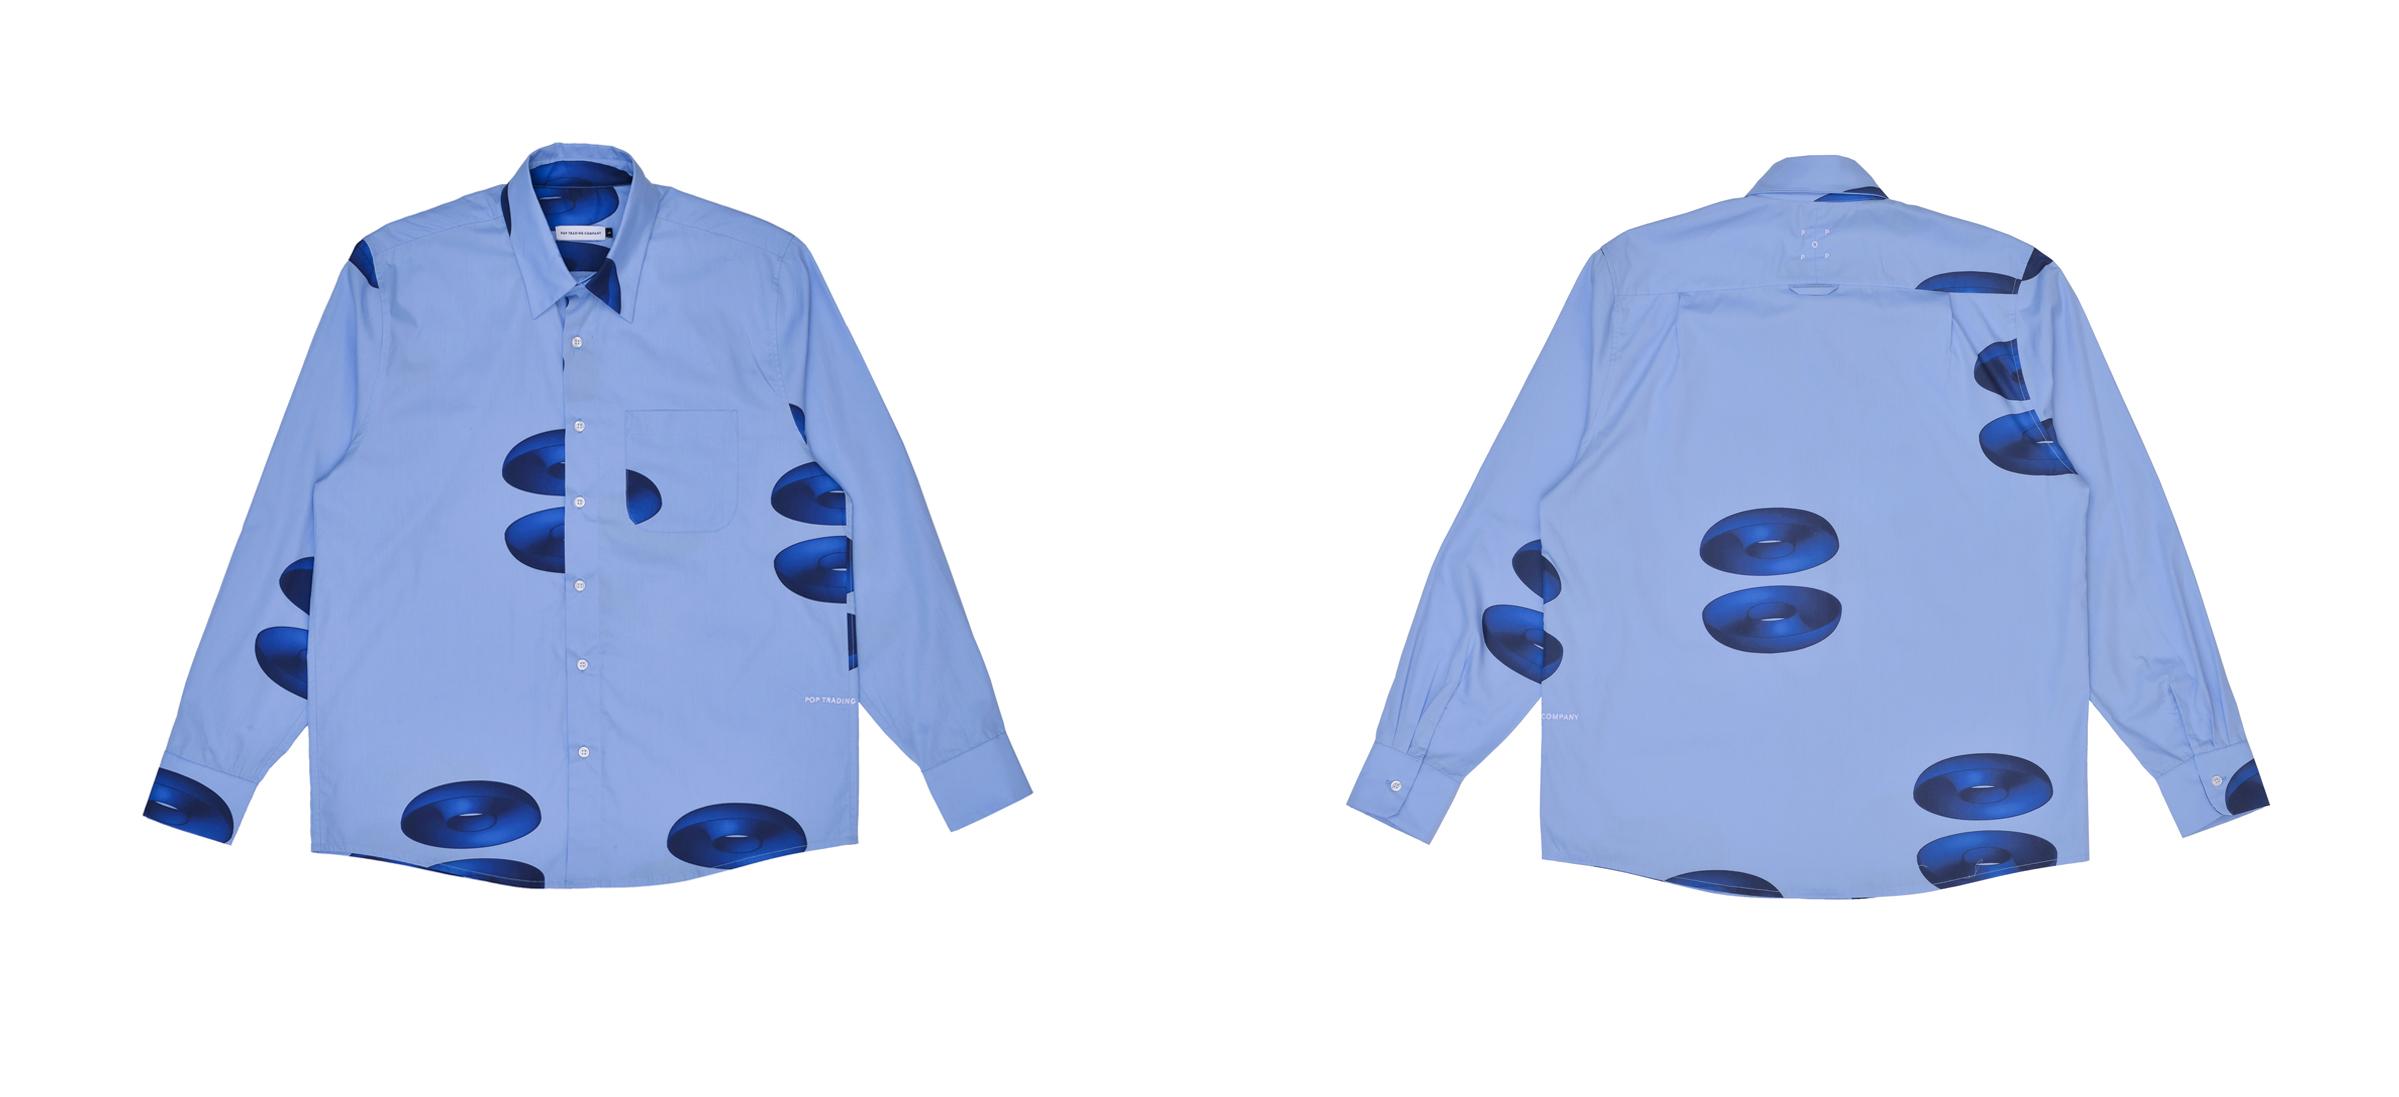 pop-ss21-thomas-van-rijs-for-pop-trading-company-shirt